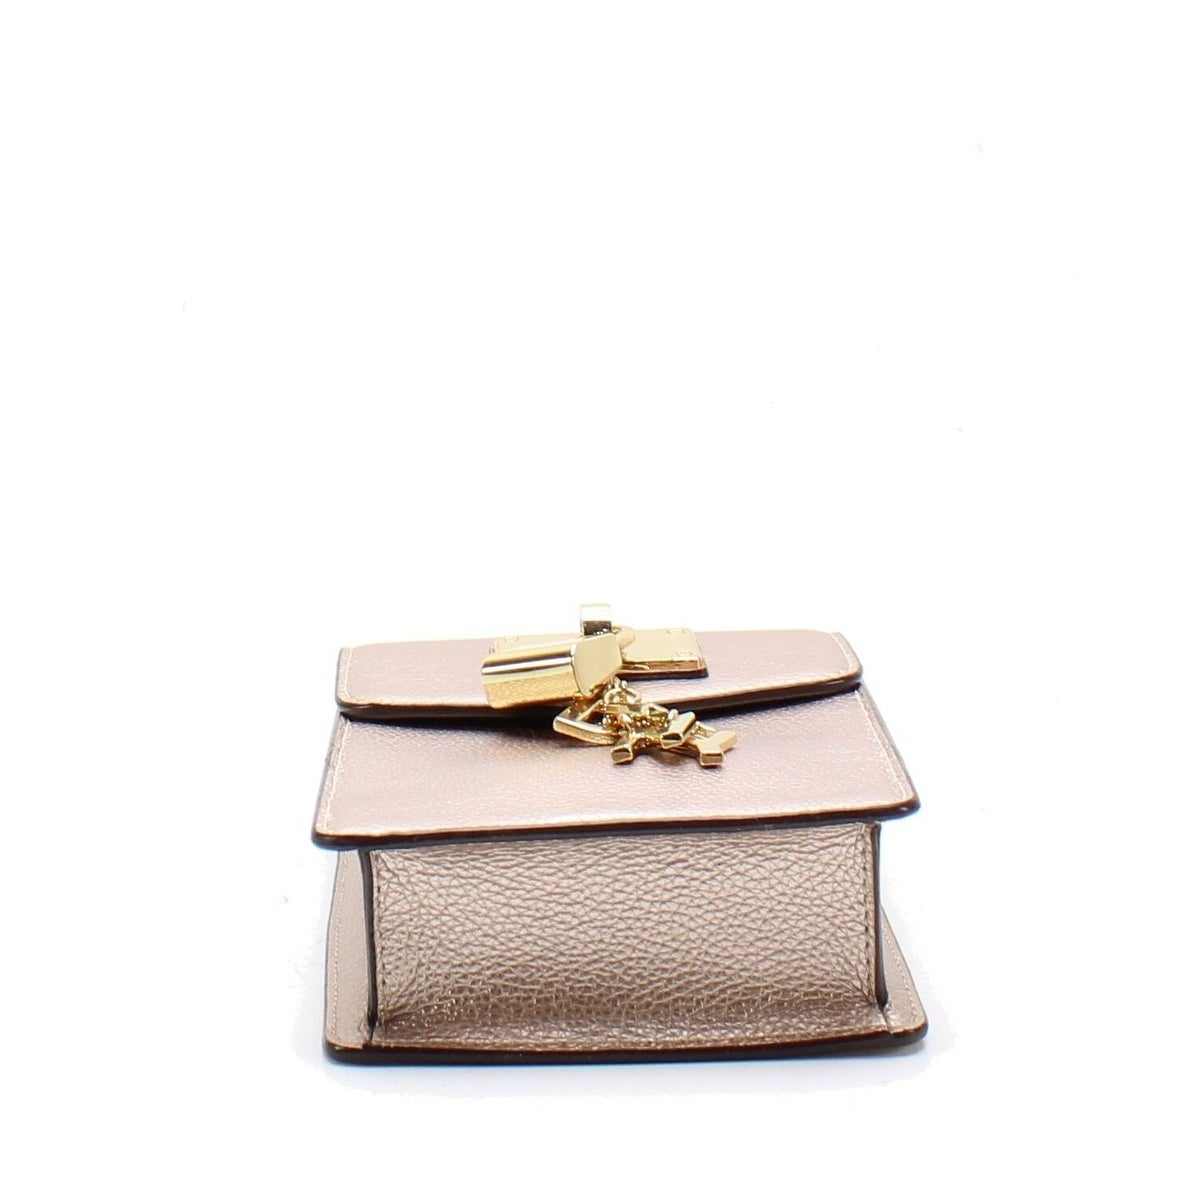 c72457ad6 Shop DKNY Elissa Pebbled Charm Mini Chain Strap Crossbody Bag Rosegold -  Ships To Canada - Overstock - 27297324